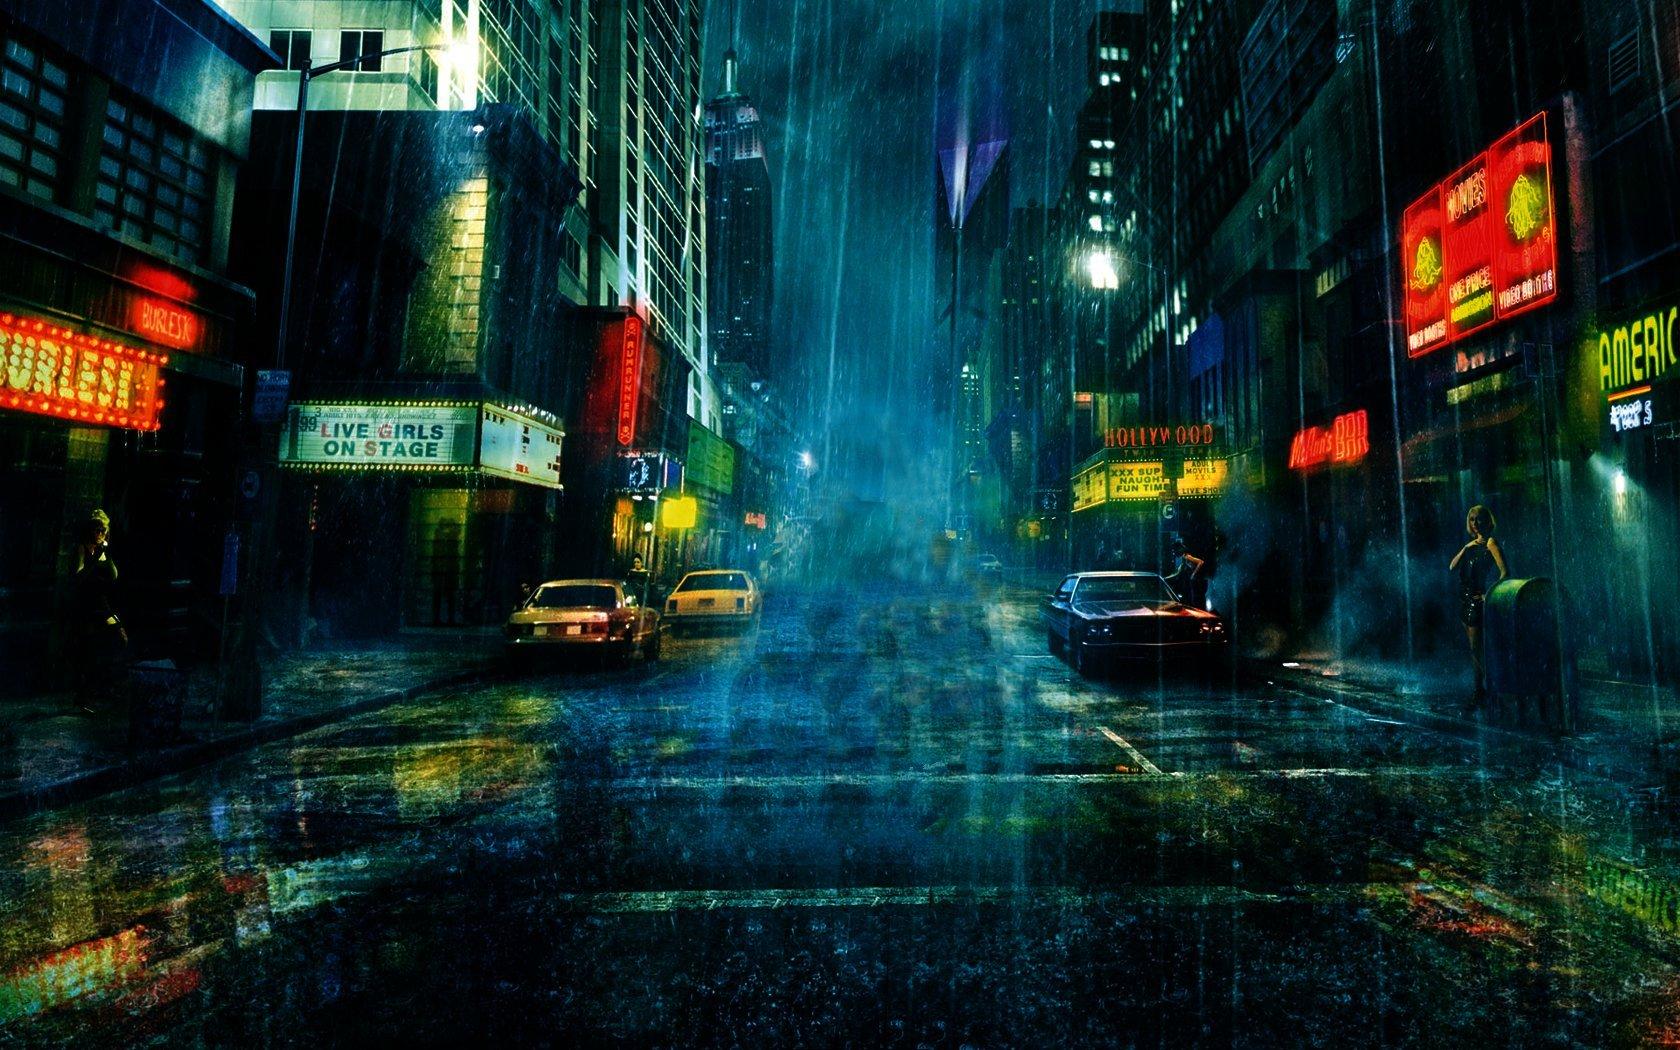 Raining hd wallpapers wallpapersafari - Rainy hd wallpaper for pc ...